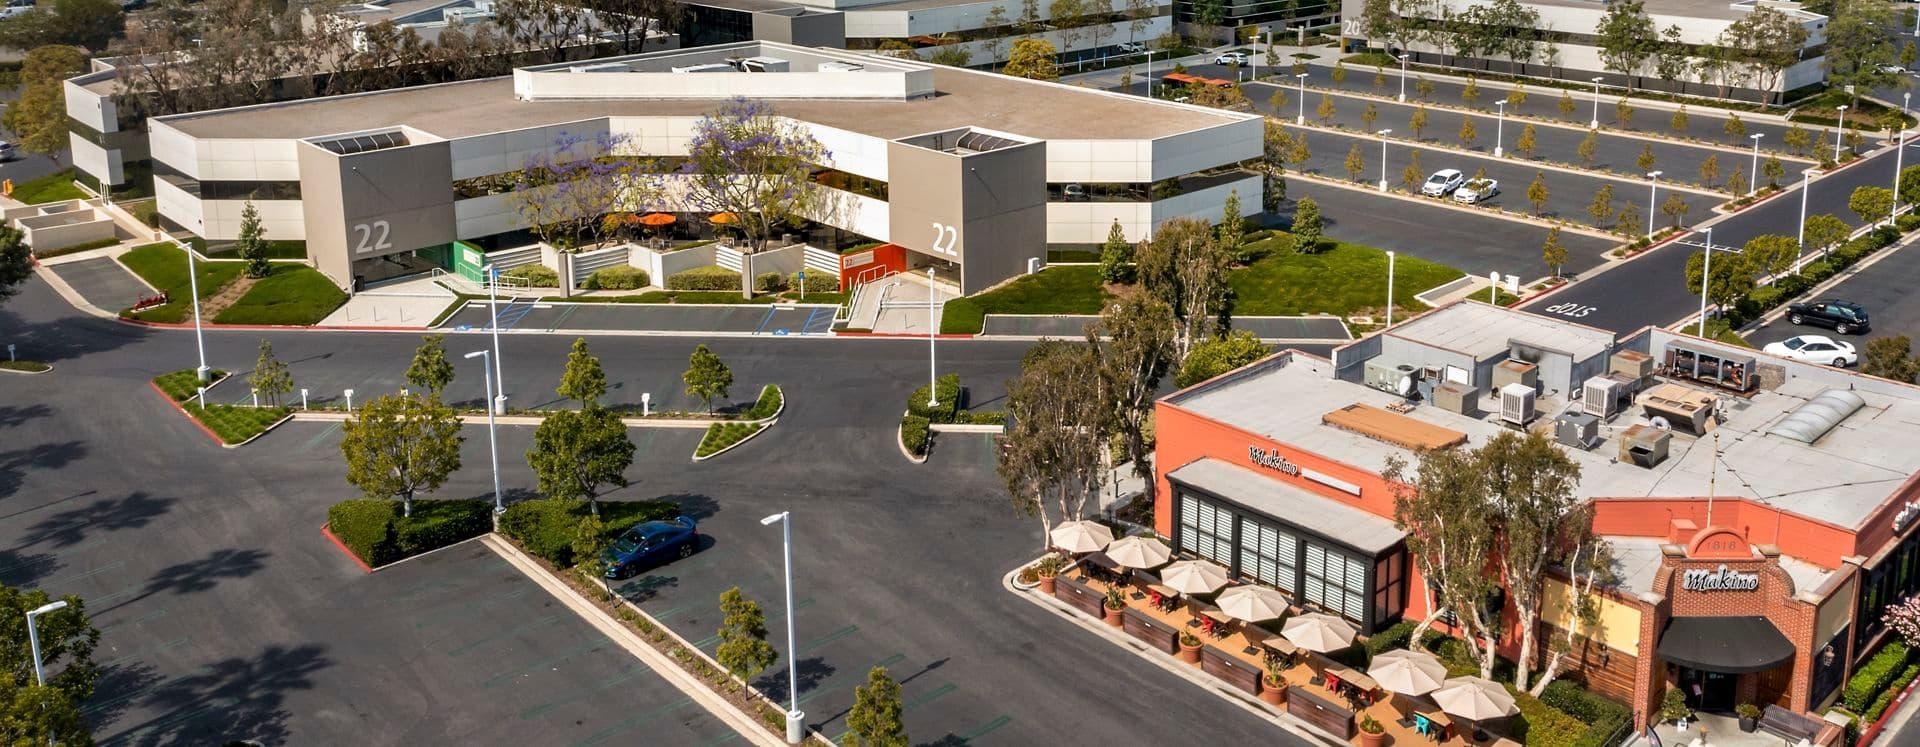 Exterior photography of Venture Park, in Irvine, CA.